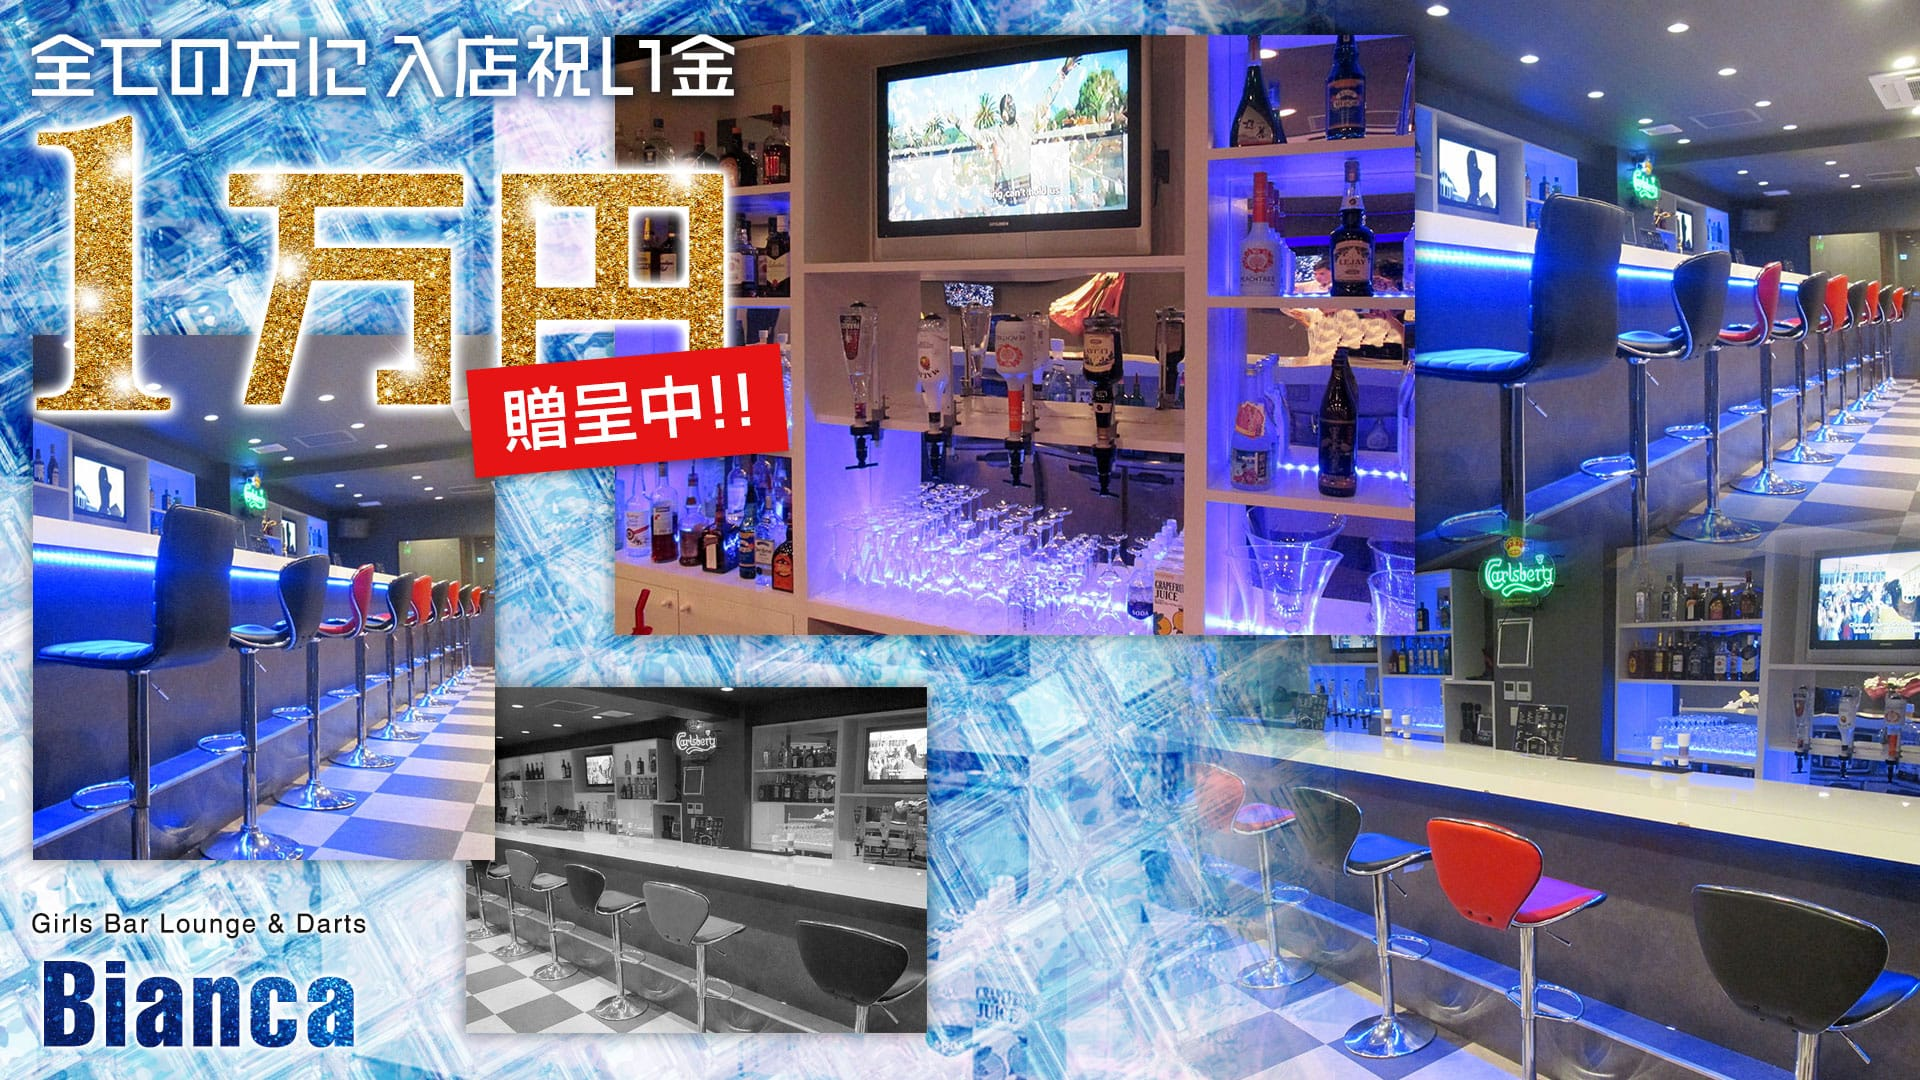 Girls Bar Lounge & Darts -Bianca-(ビアンカ) TOP画像